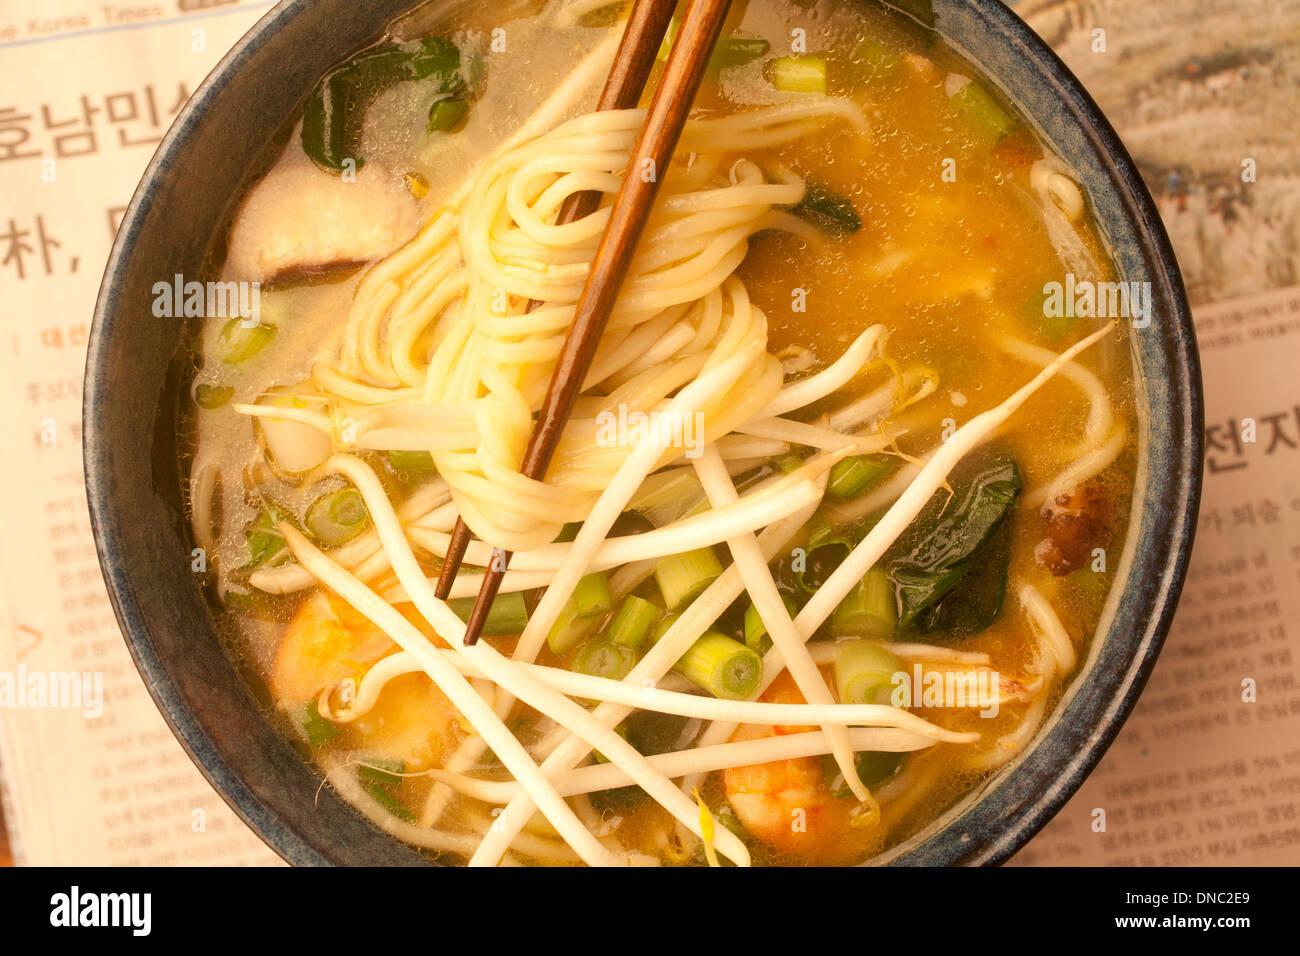 Close up of ramen noodle soup overhead with chopsticks - Stock Image